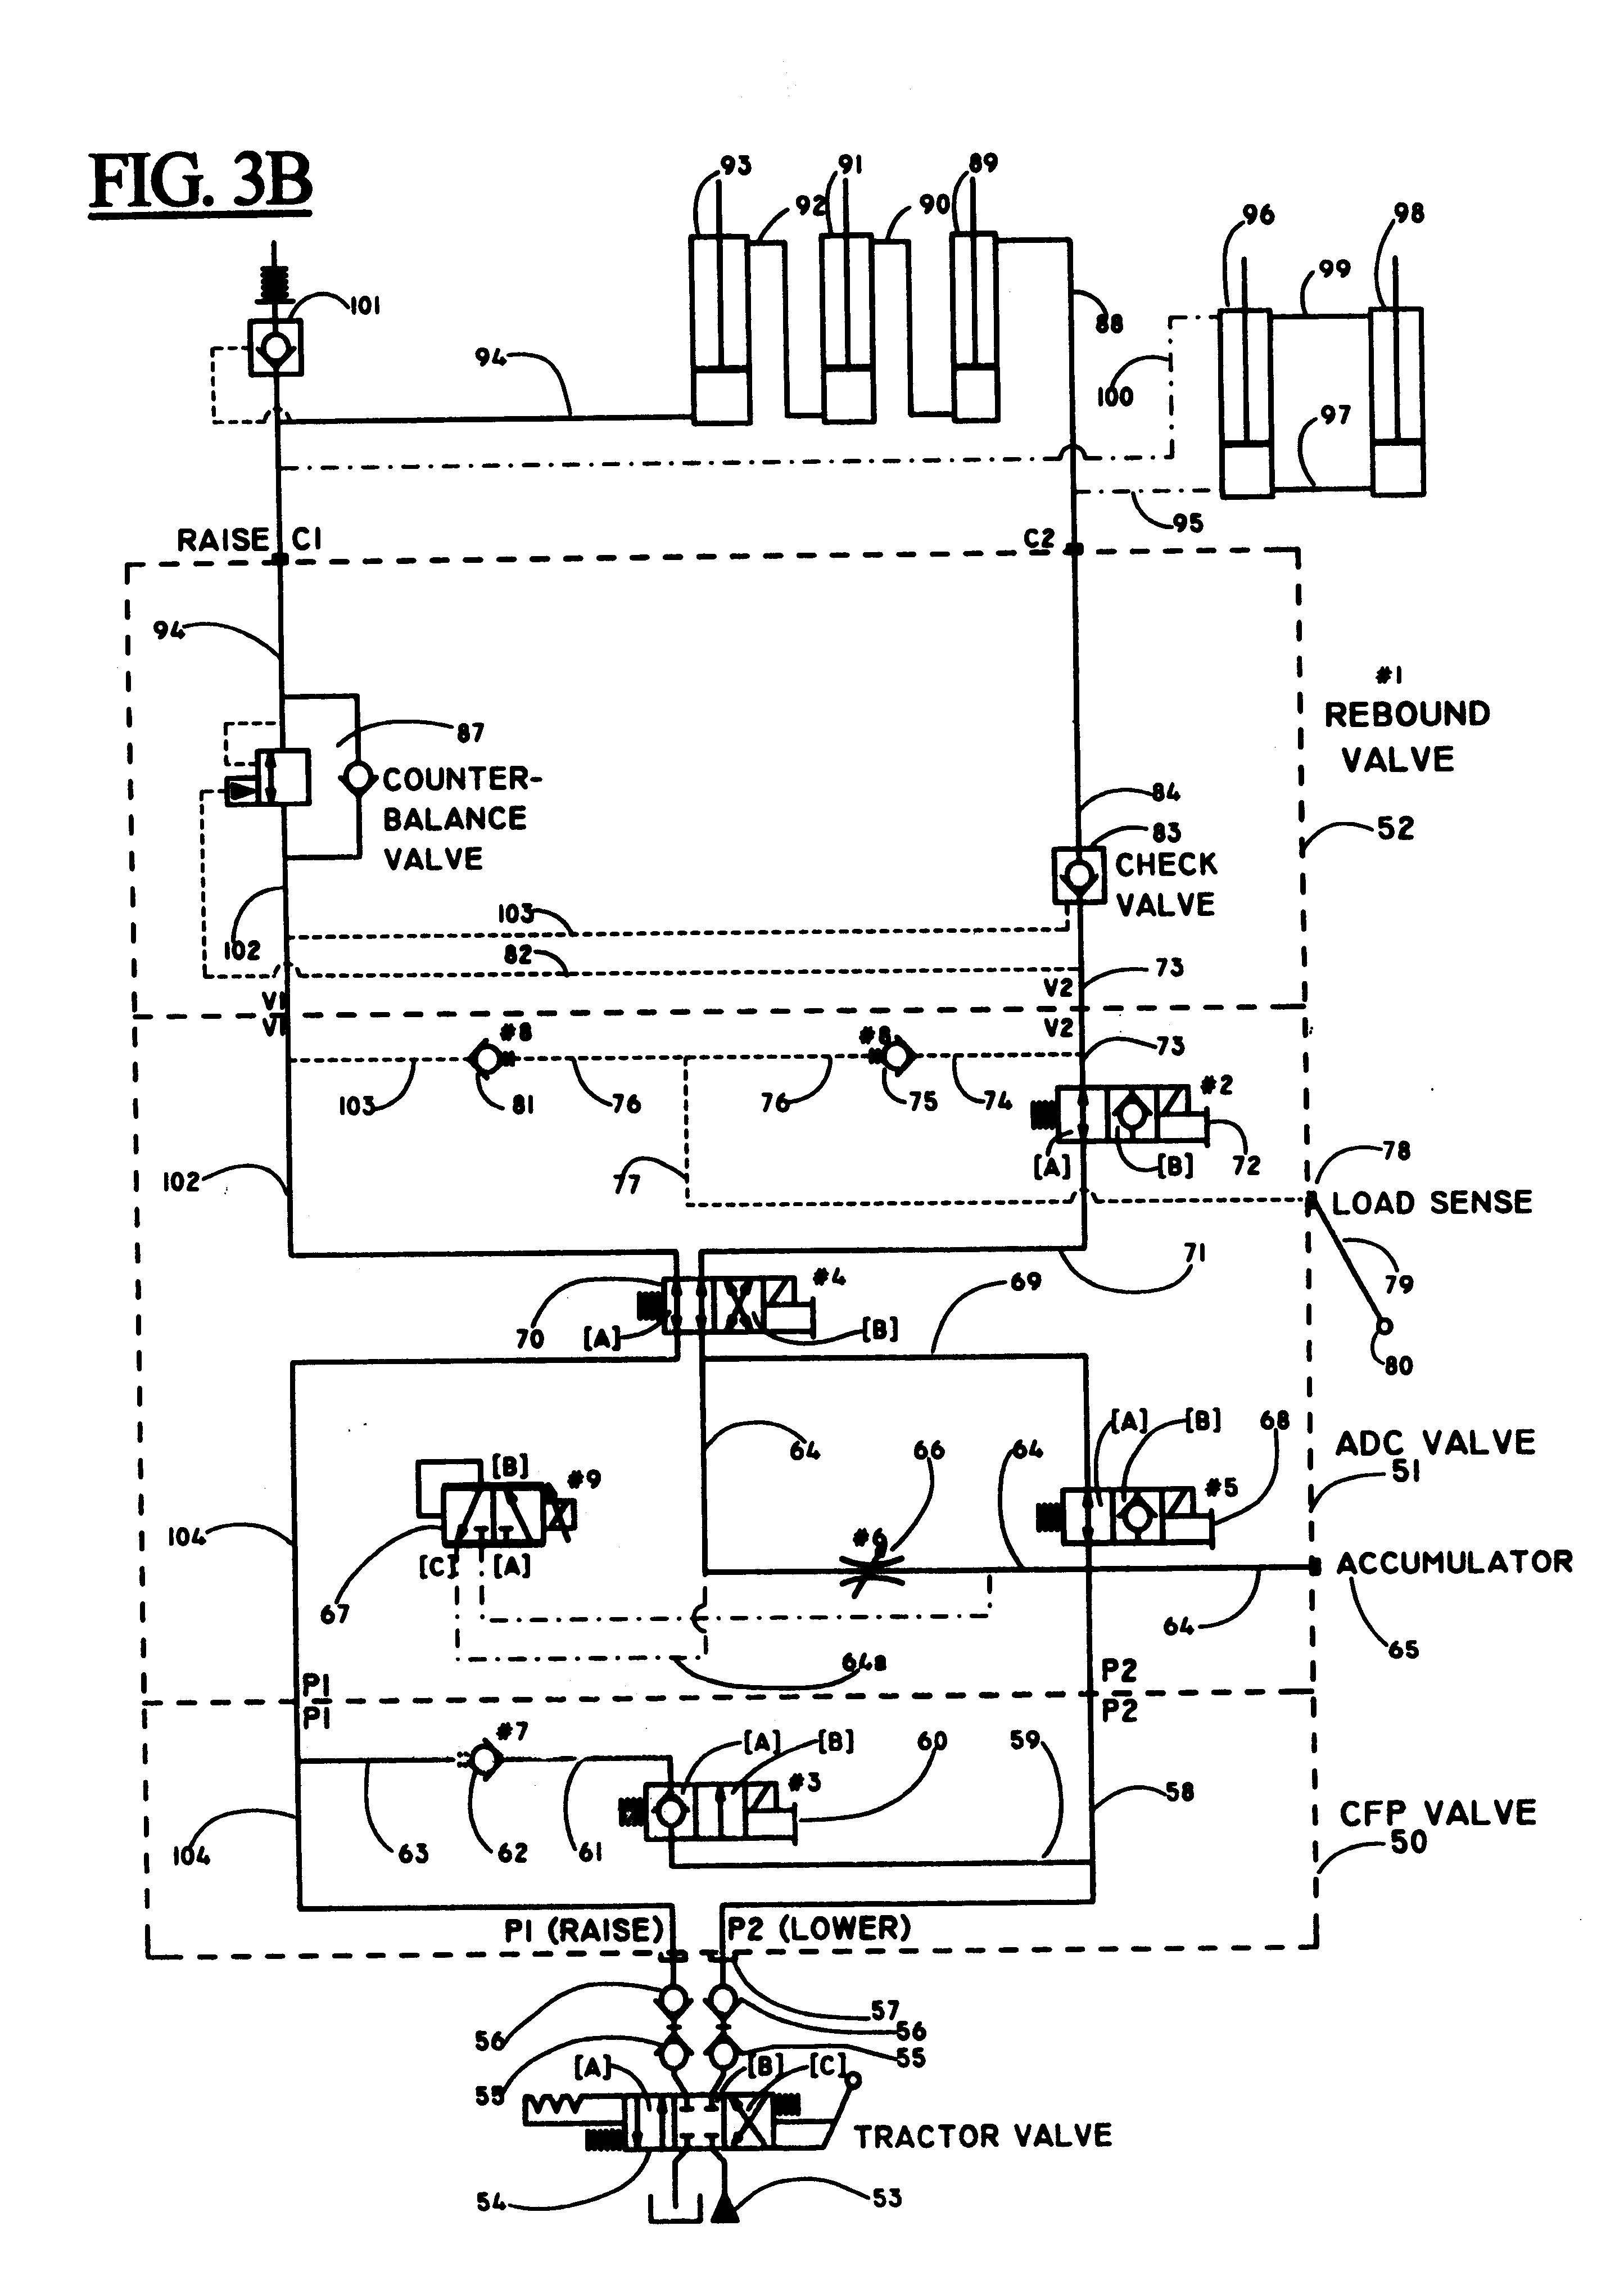 john deere model 68 wiring diagram fe 9907  with john deere wiring diagrams also john deere wiring  with john deere wiring diagrams also